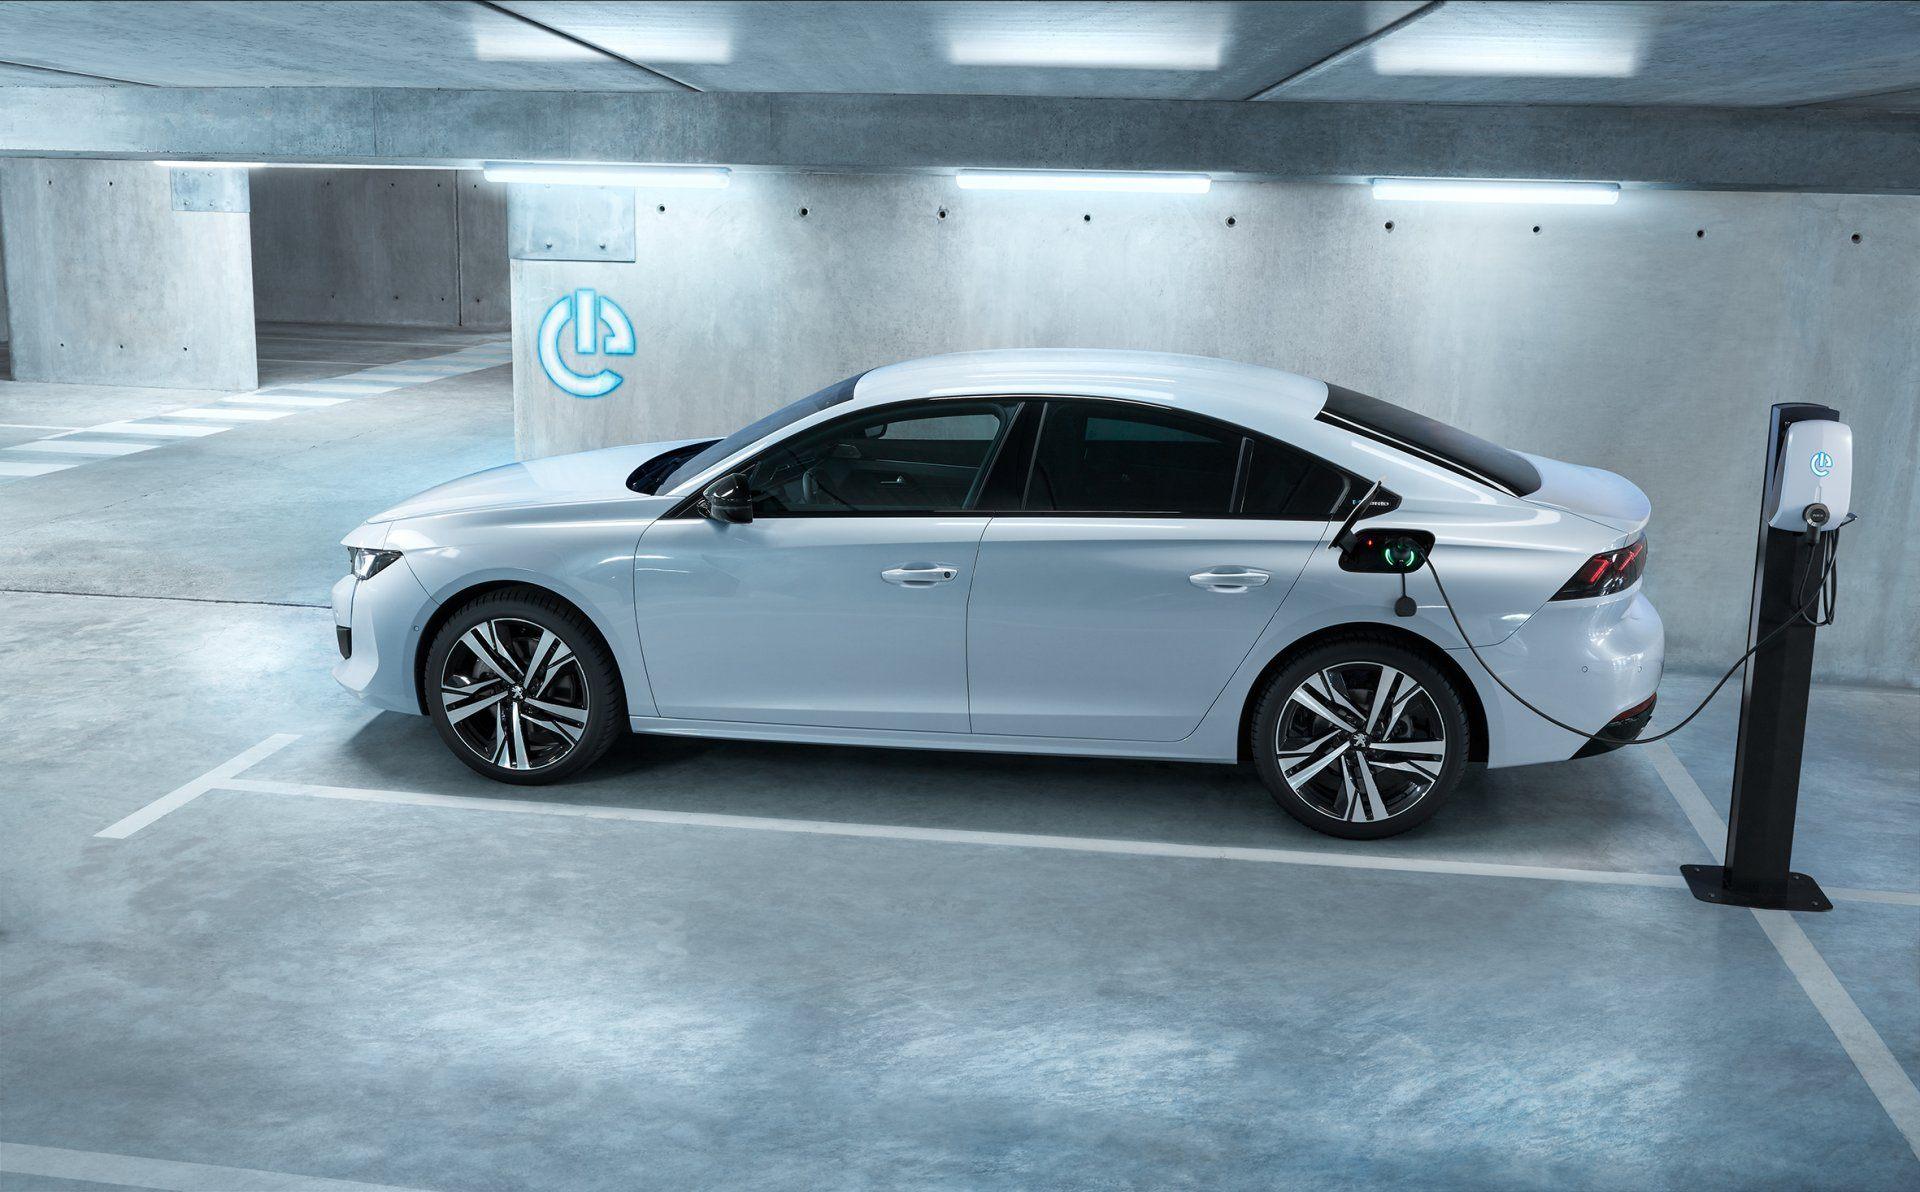 La gama de híbridos enchufables de Peugeot arranca en 35.200 euros